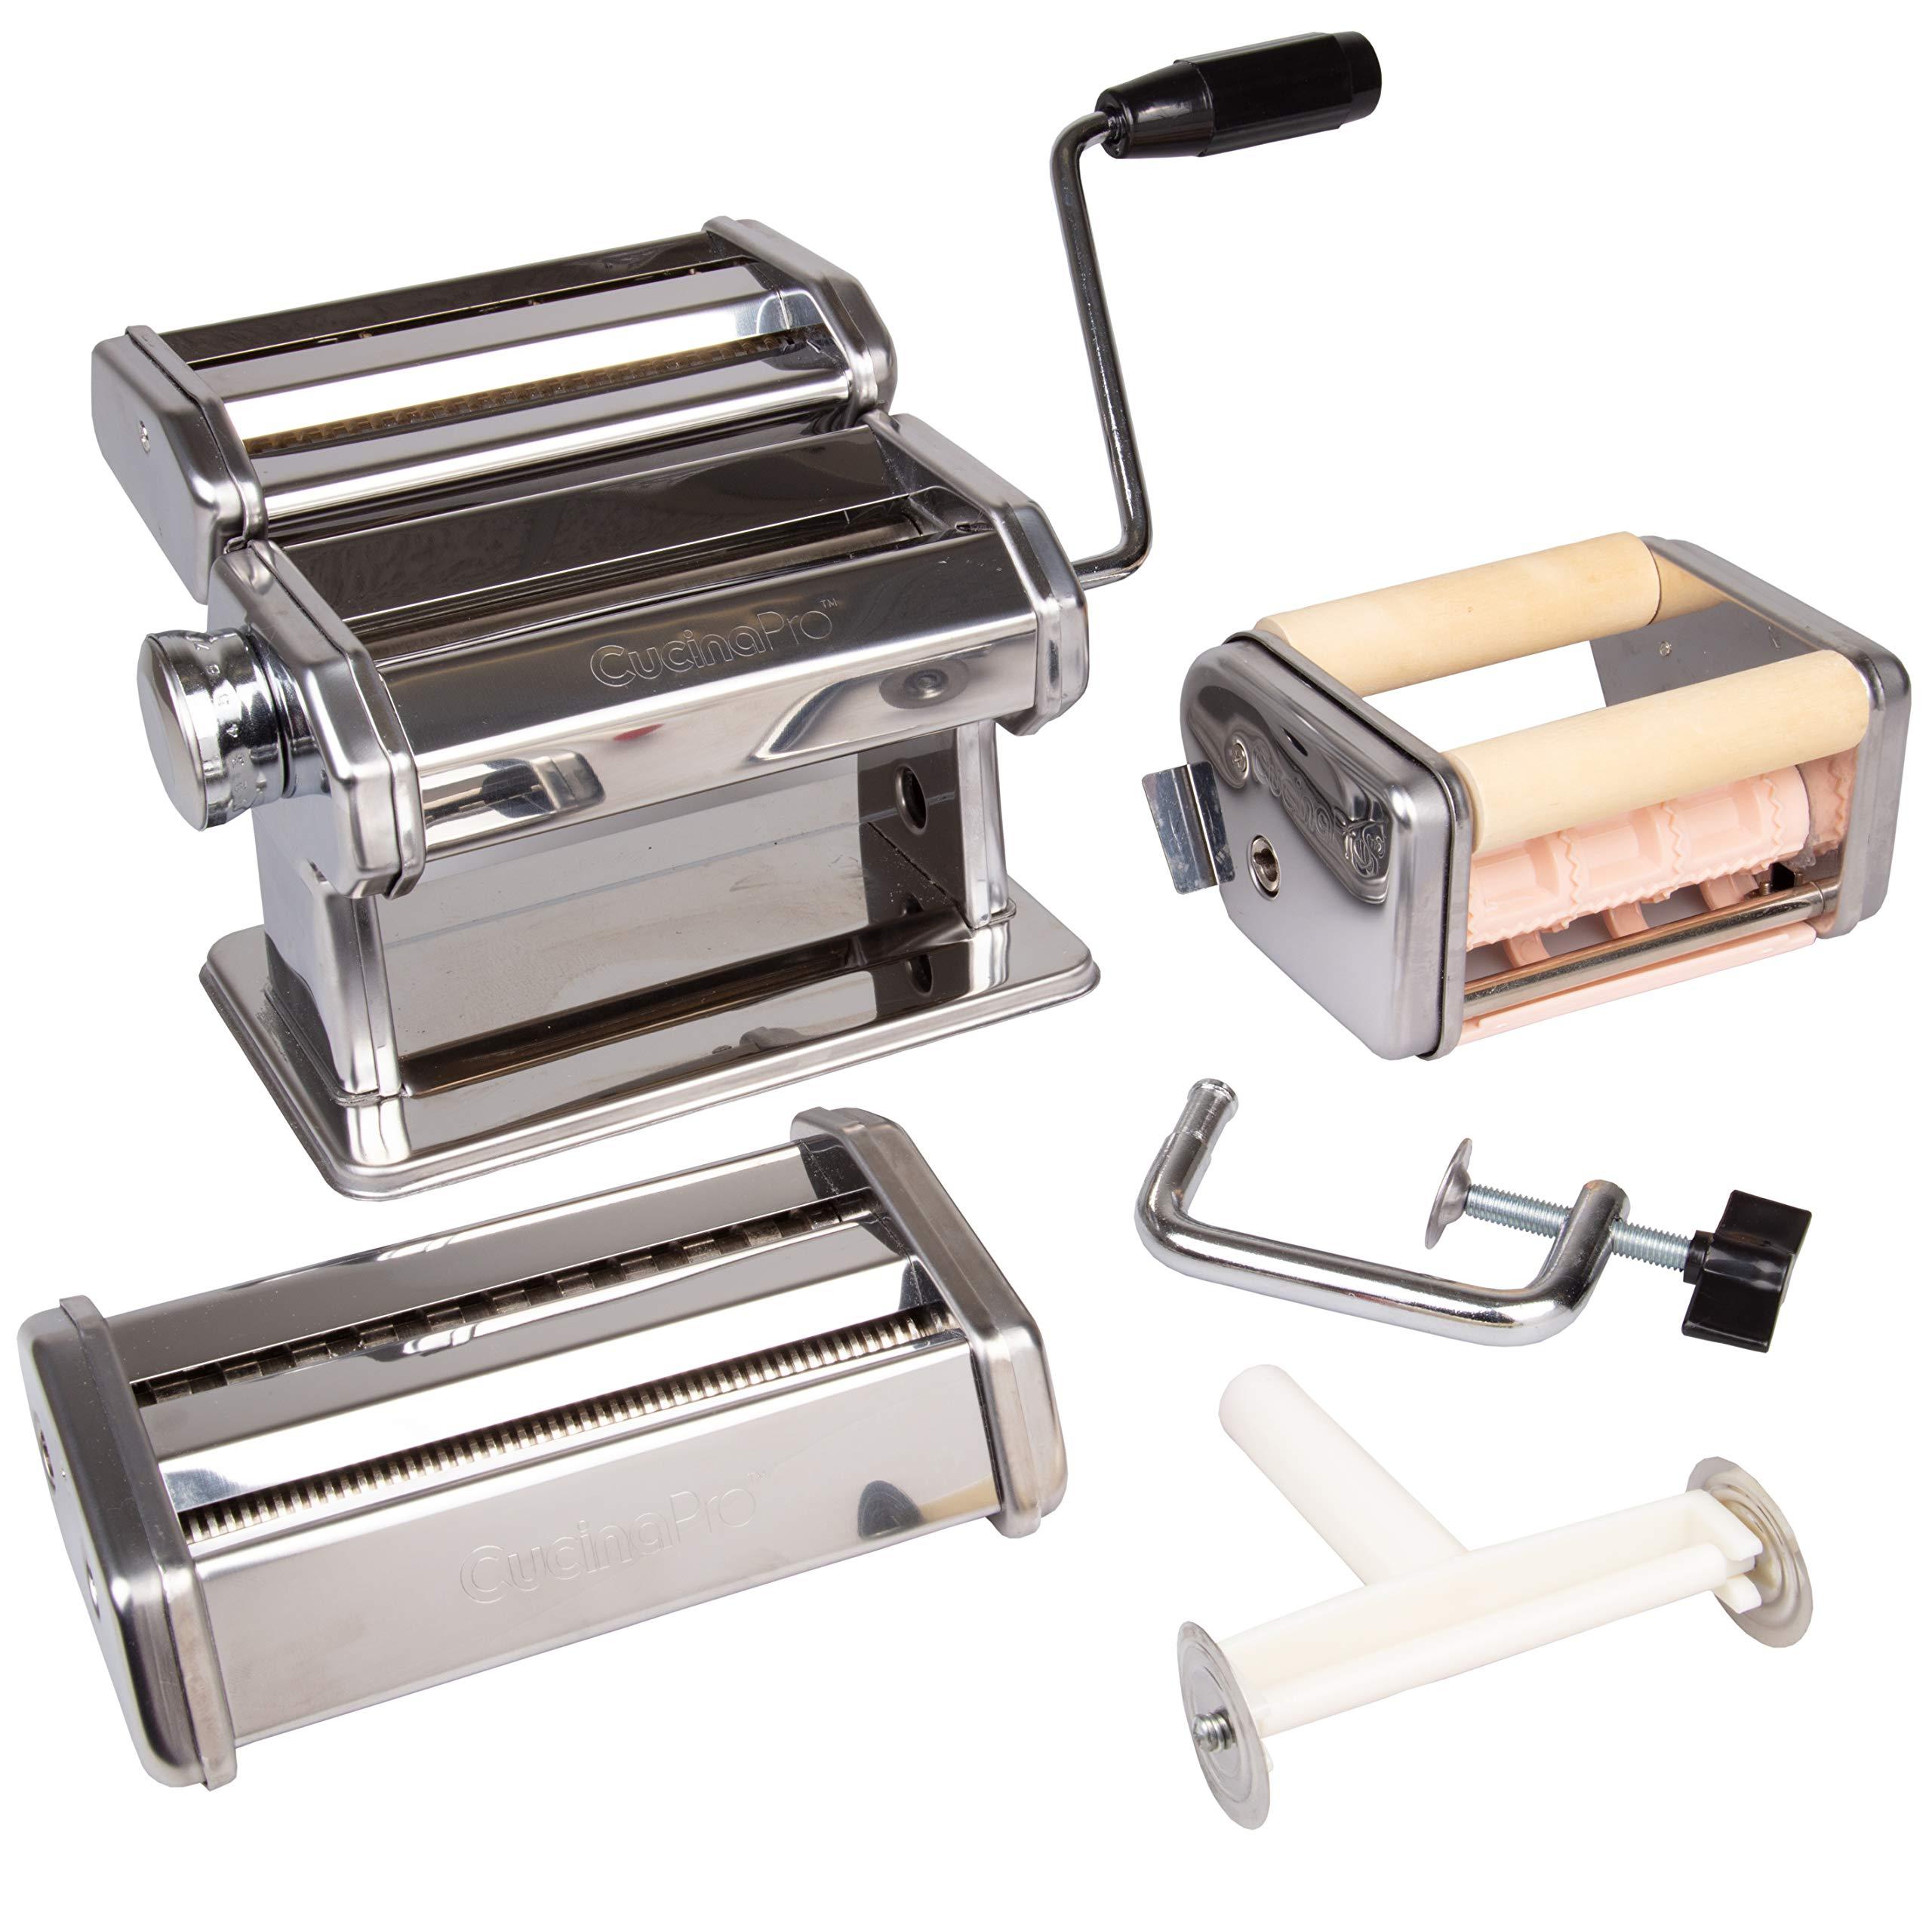 Pasta Maker Deluxe Set- Machine w Attachments for 5 Authentic Pastas- Spaghetti, Fettucini, Angel Hair, Ravioli, Lasagnette All in One by CucinaPro